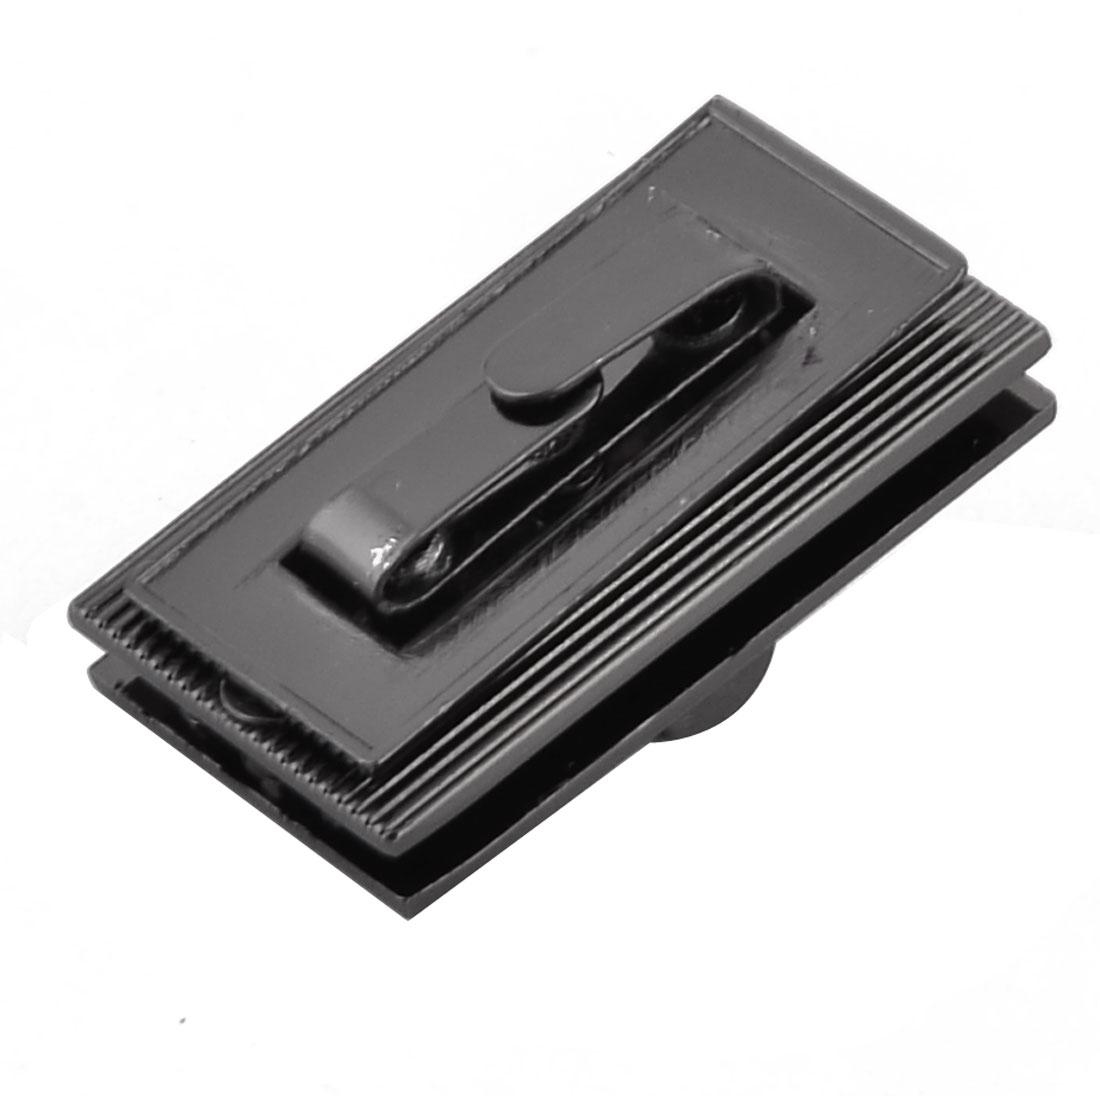 "Luggage Clothing Metal Rectangle Shaped Lock 1.1"" x 0.43"" Inside Size Black"